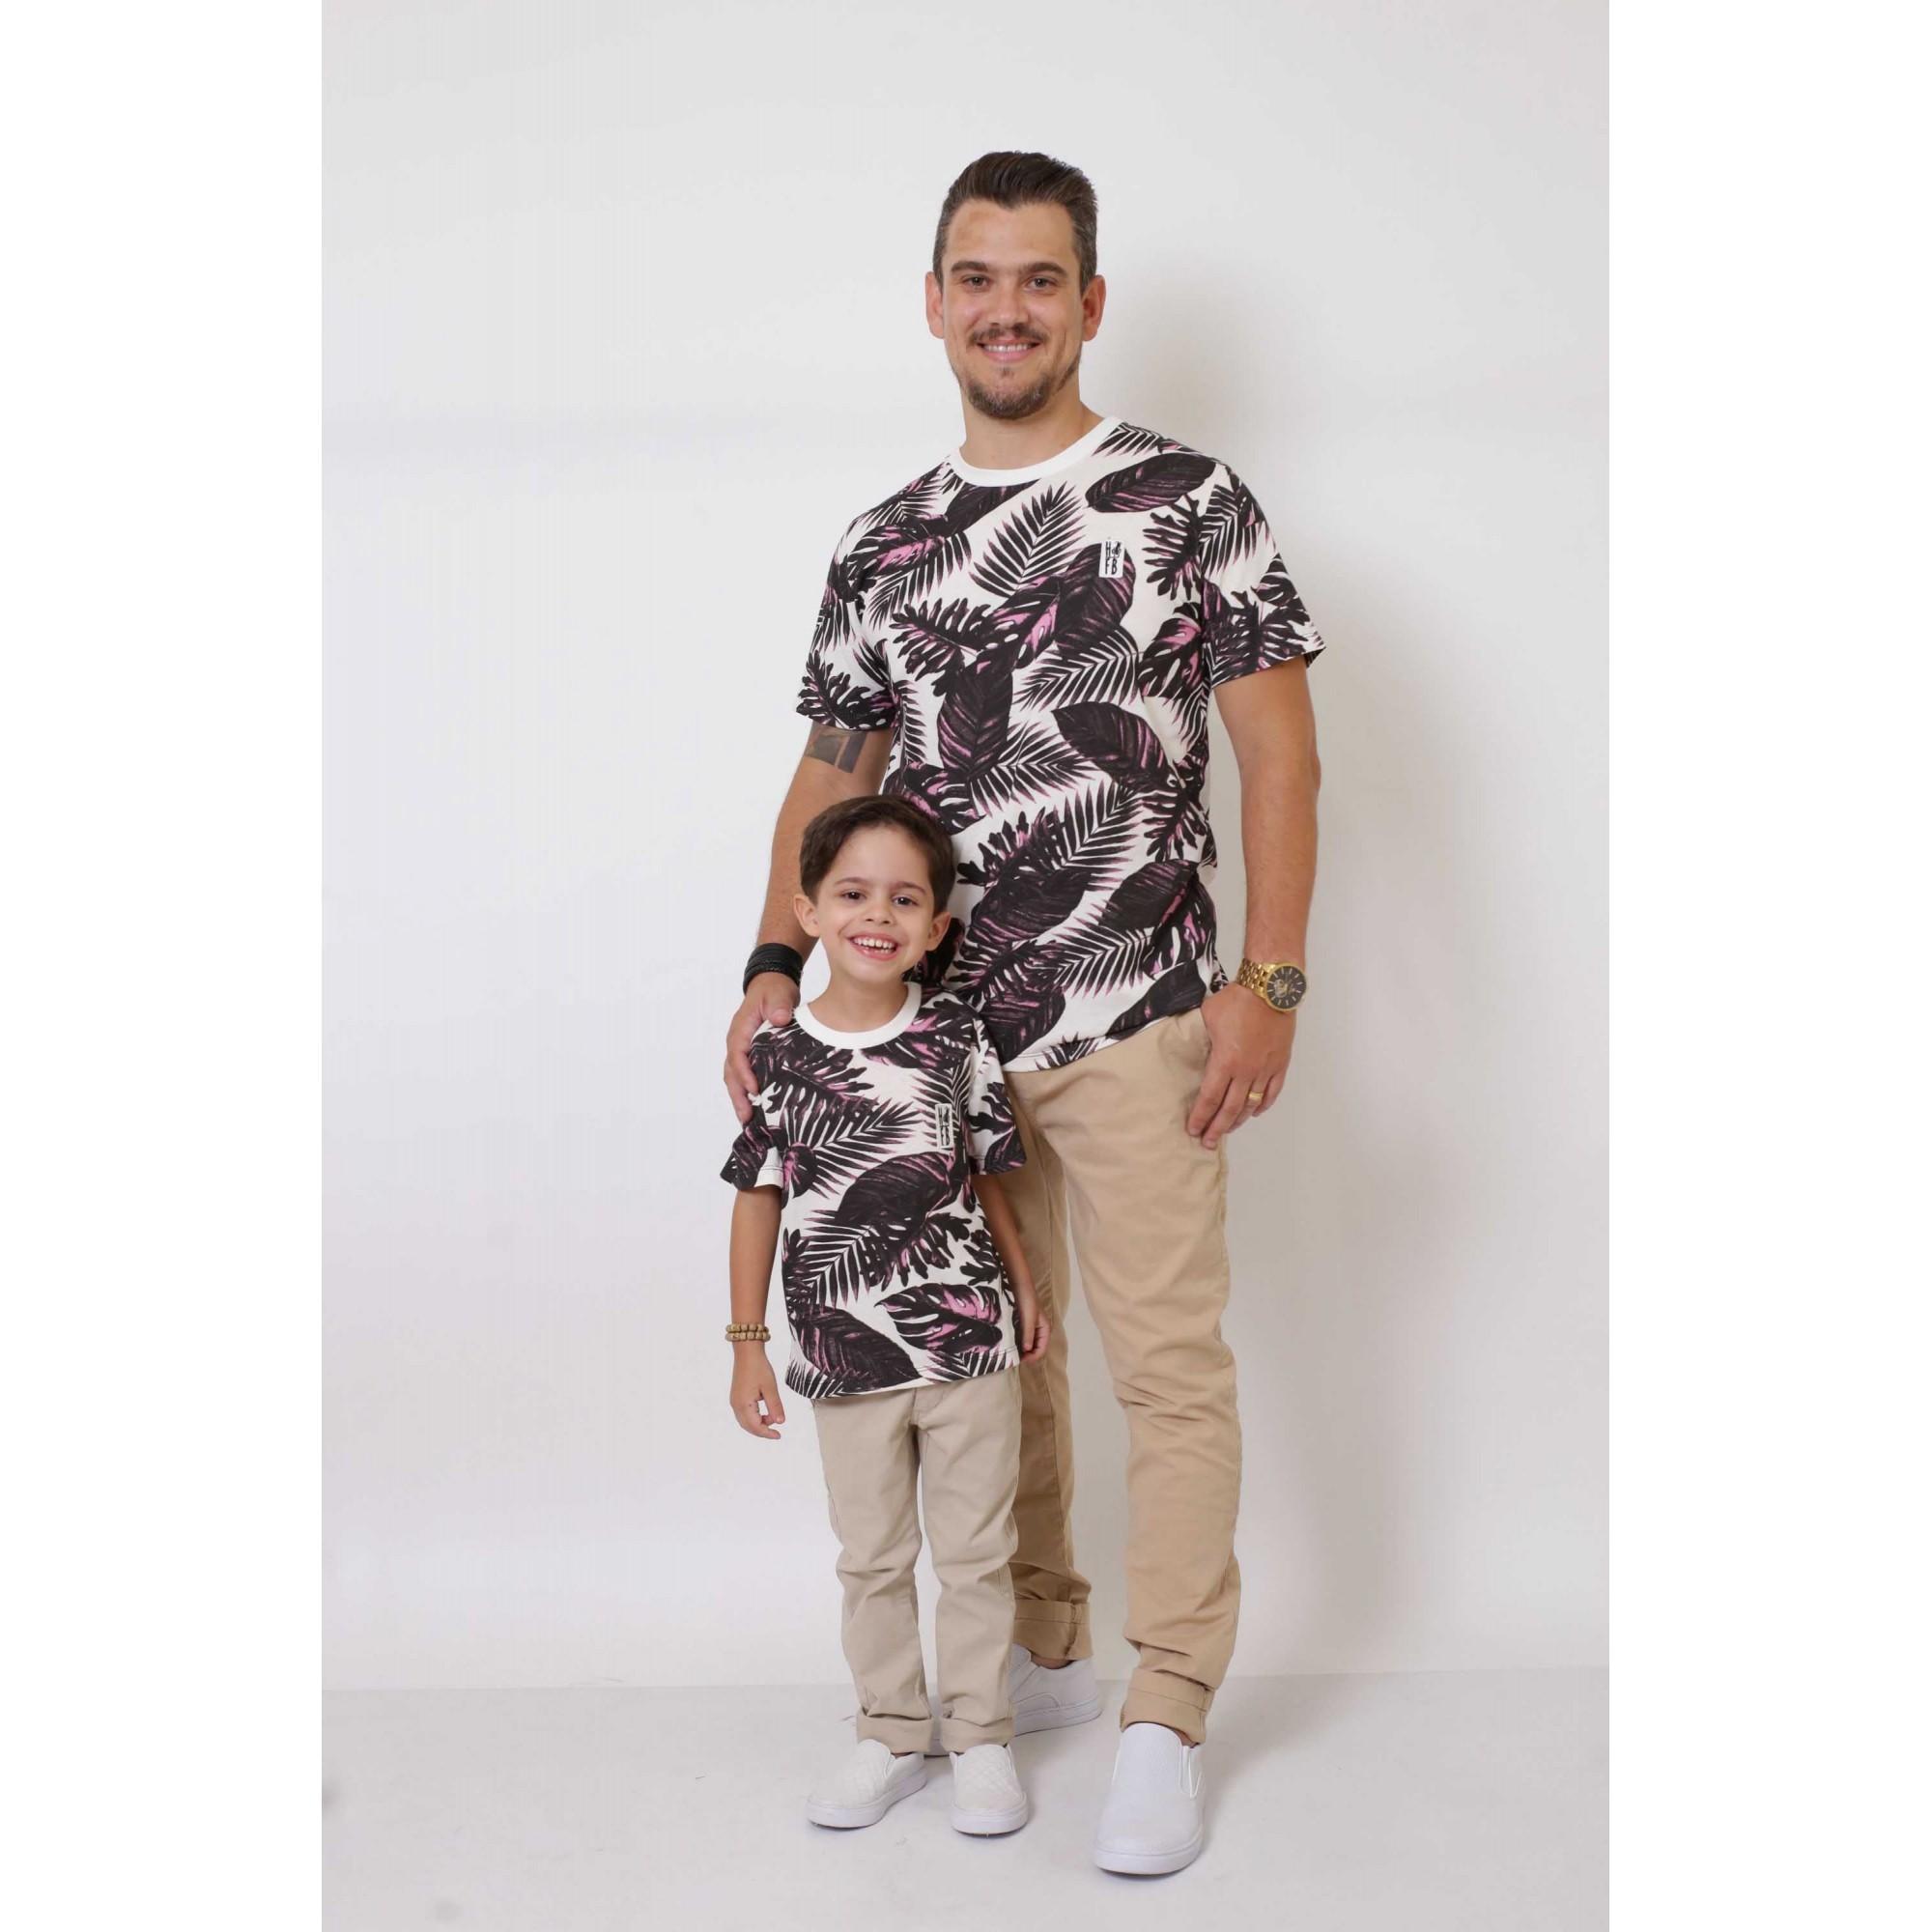 PAI E FILHO > 02 T-Shirts - Cancún [Coleção Tal Pai Tal Filho]